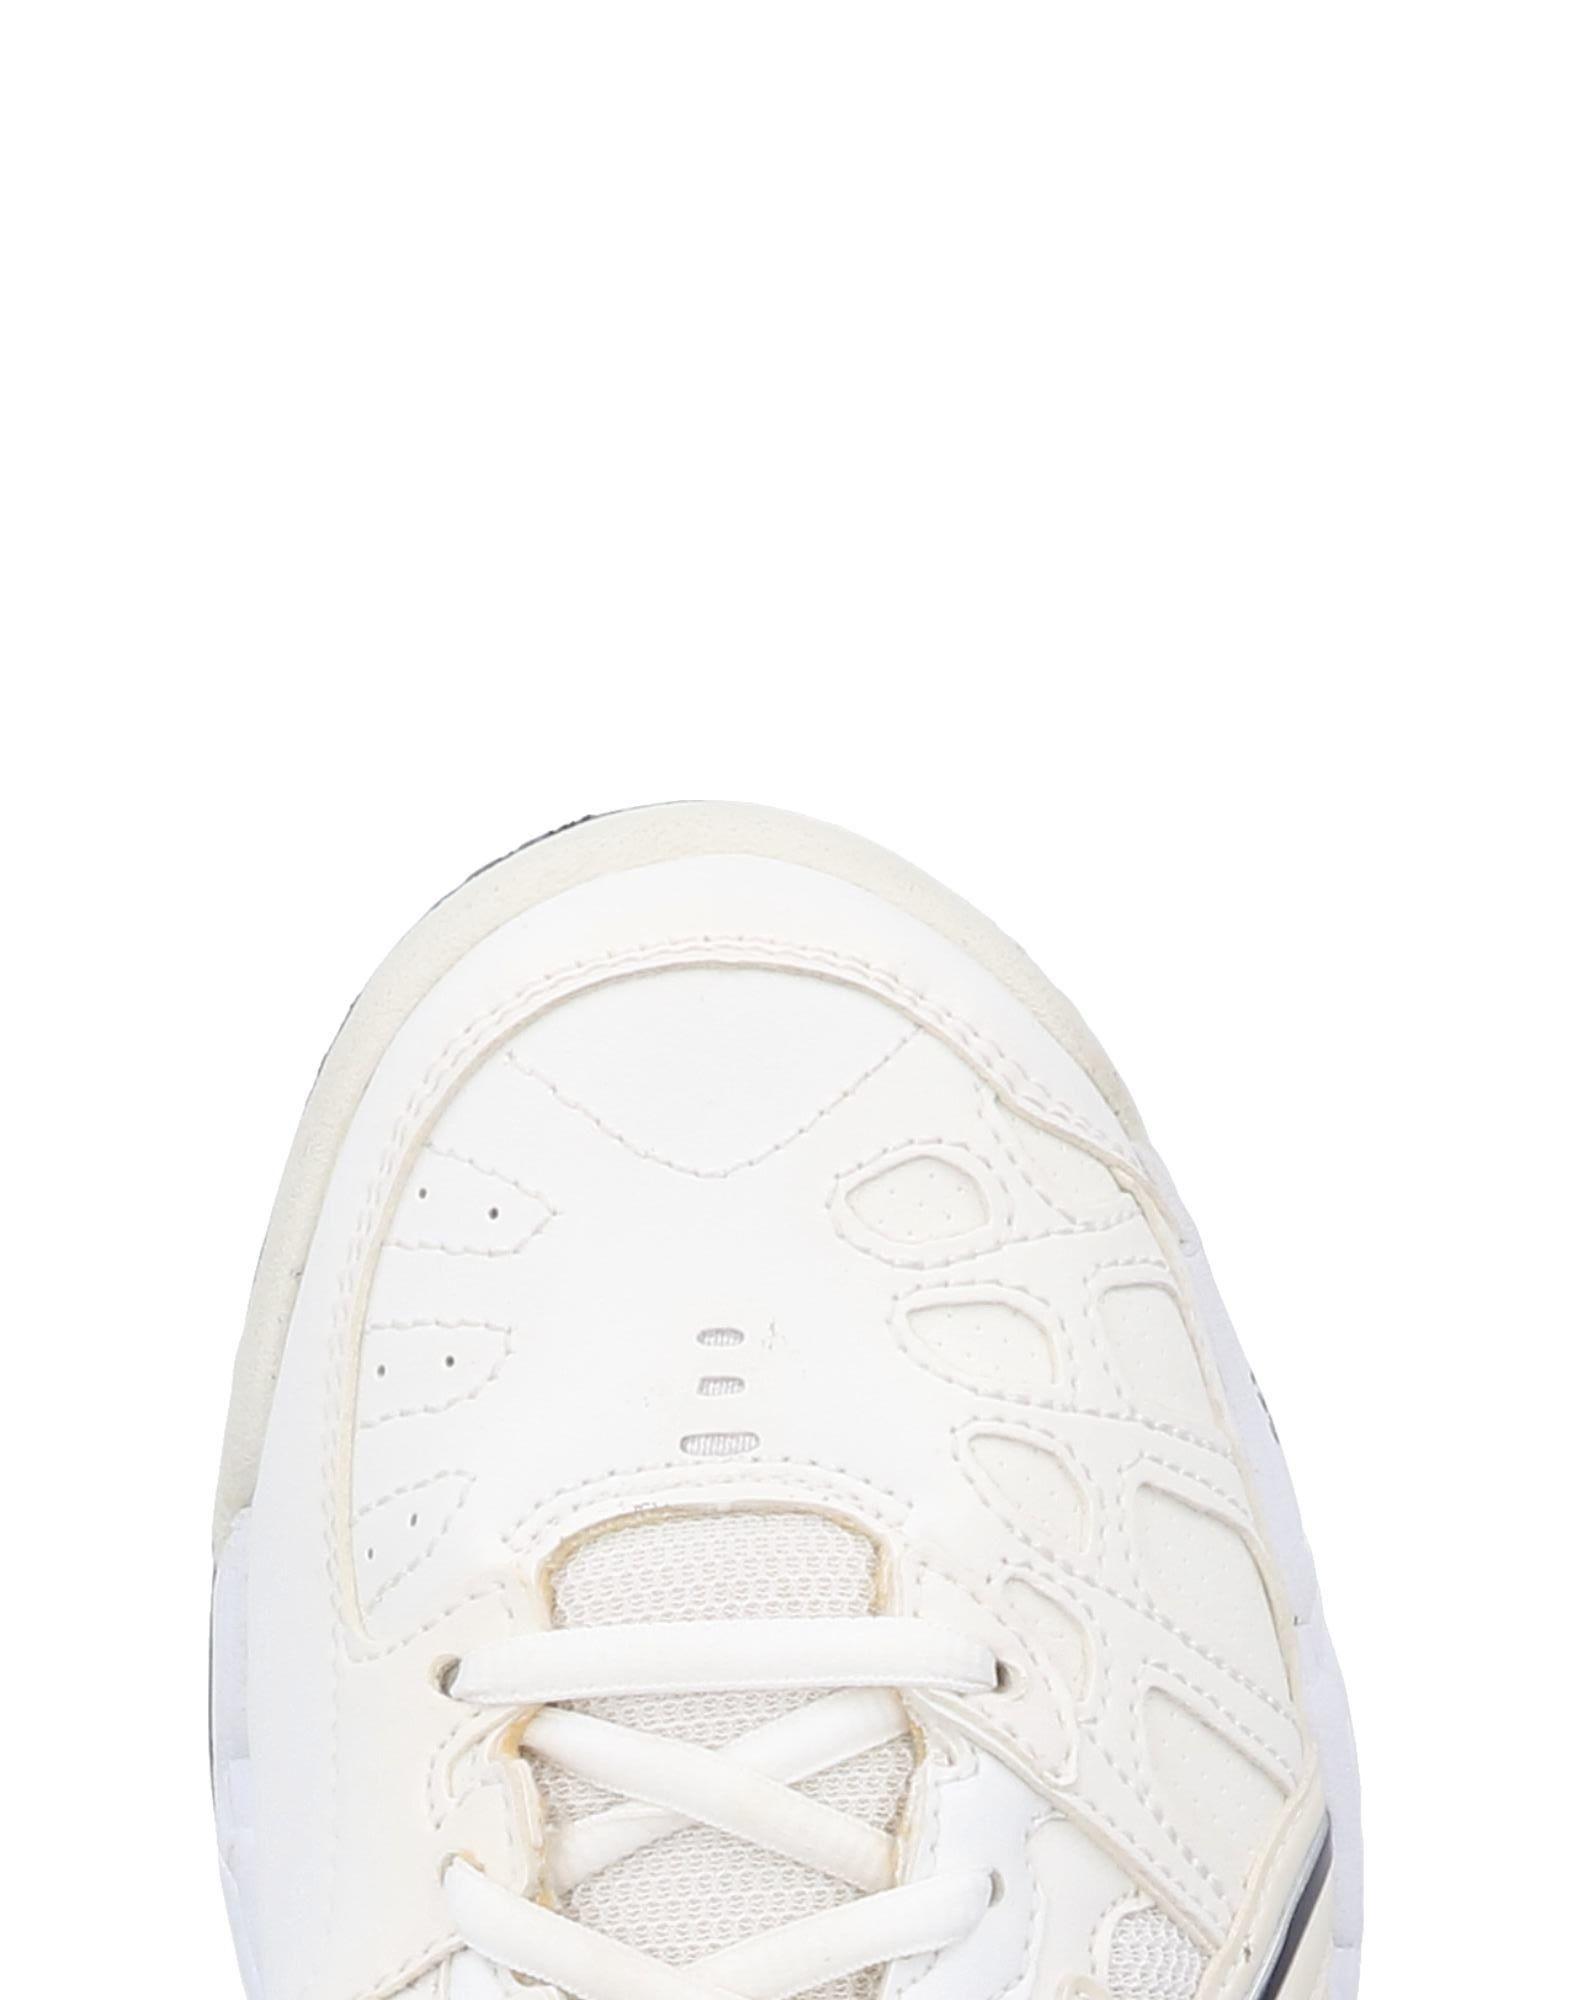 Moda Sneakers Sneakers Moda Asics Donna - 11466736DK 31c7d4